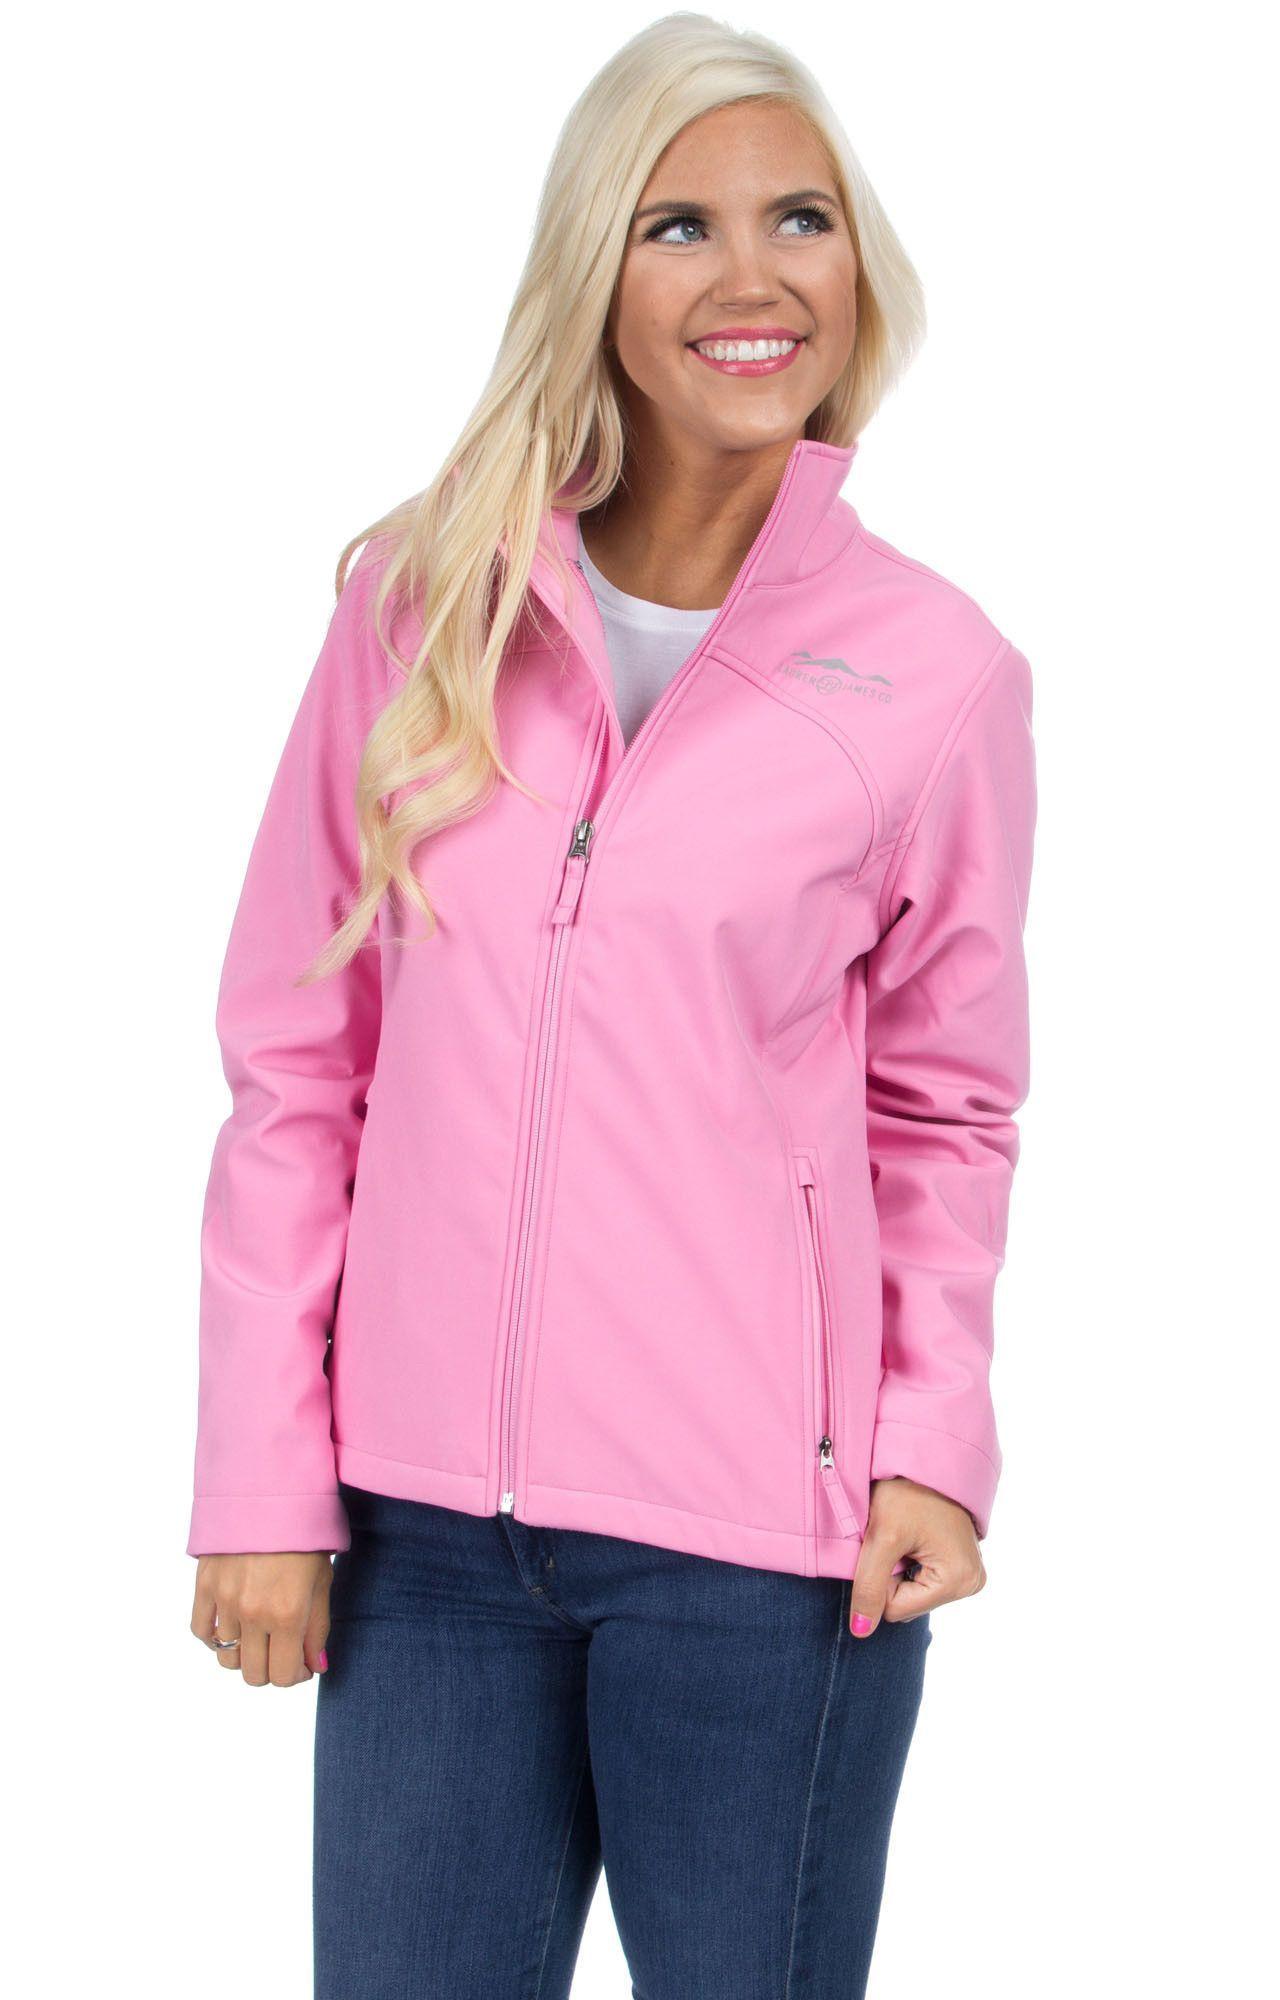 Bradford softshell jacket by Lauren James